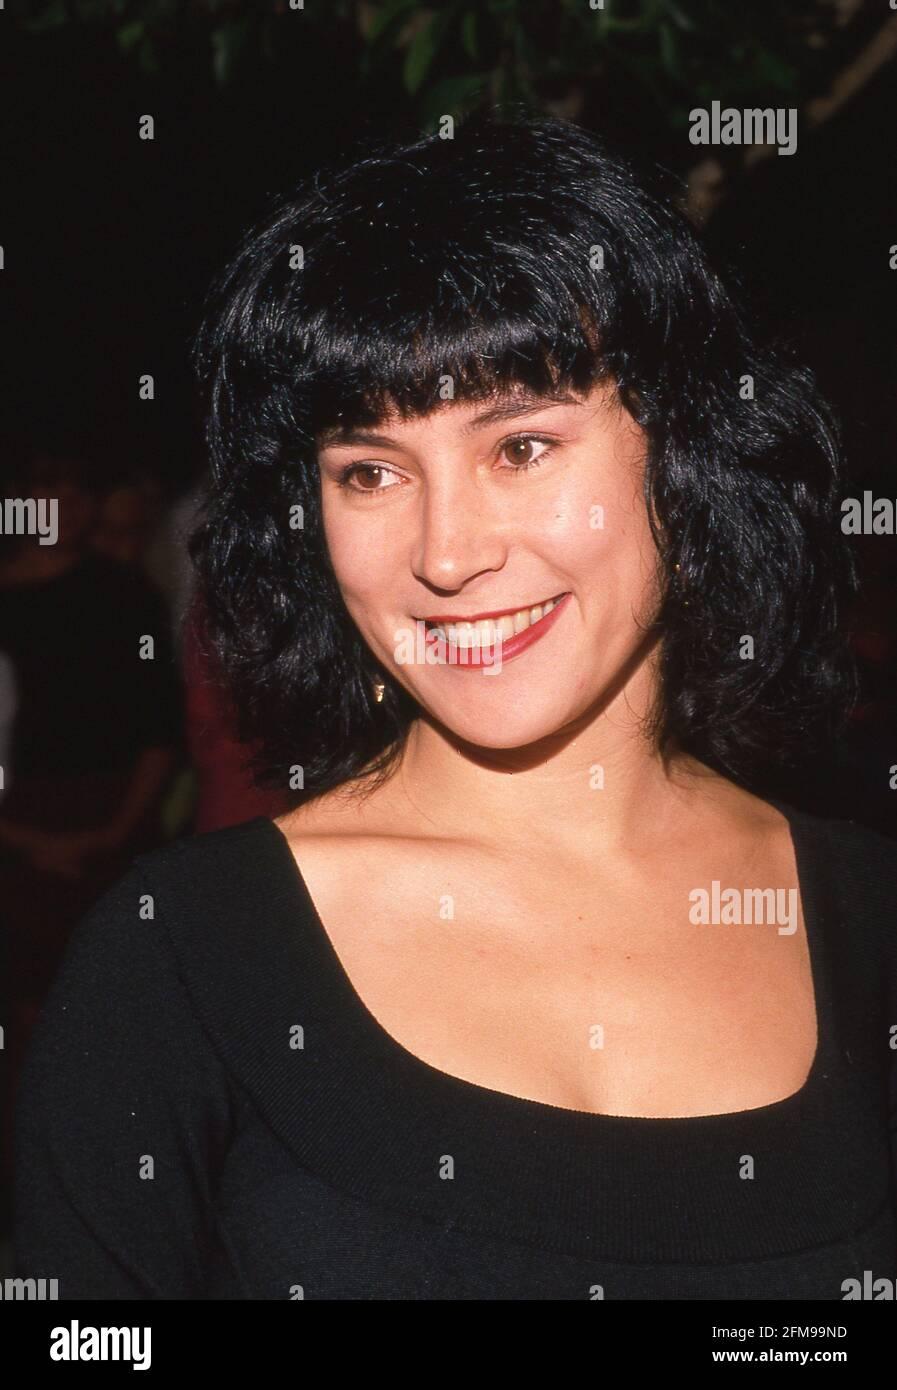 Jennifer Tilly juin 1989. Crédit: Ralph Dominguez/MediaPunch Banque D'Images